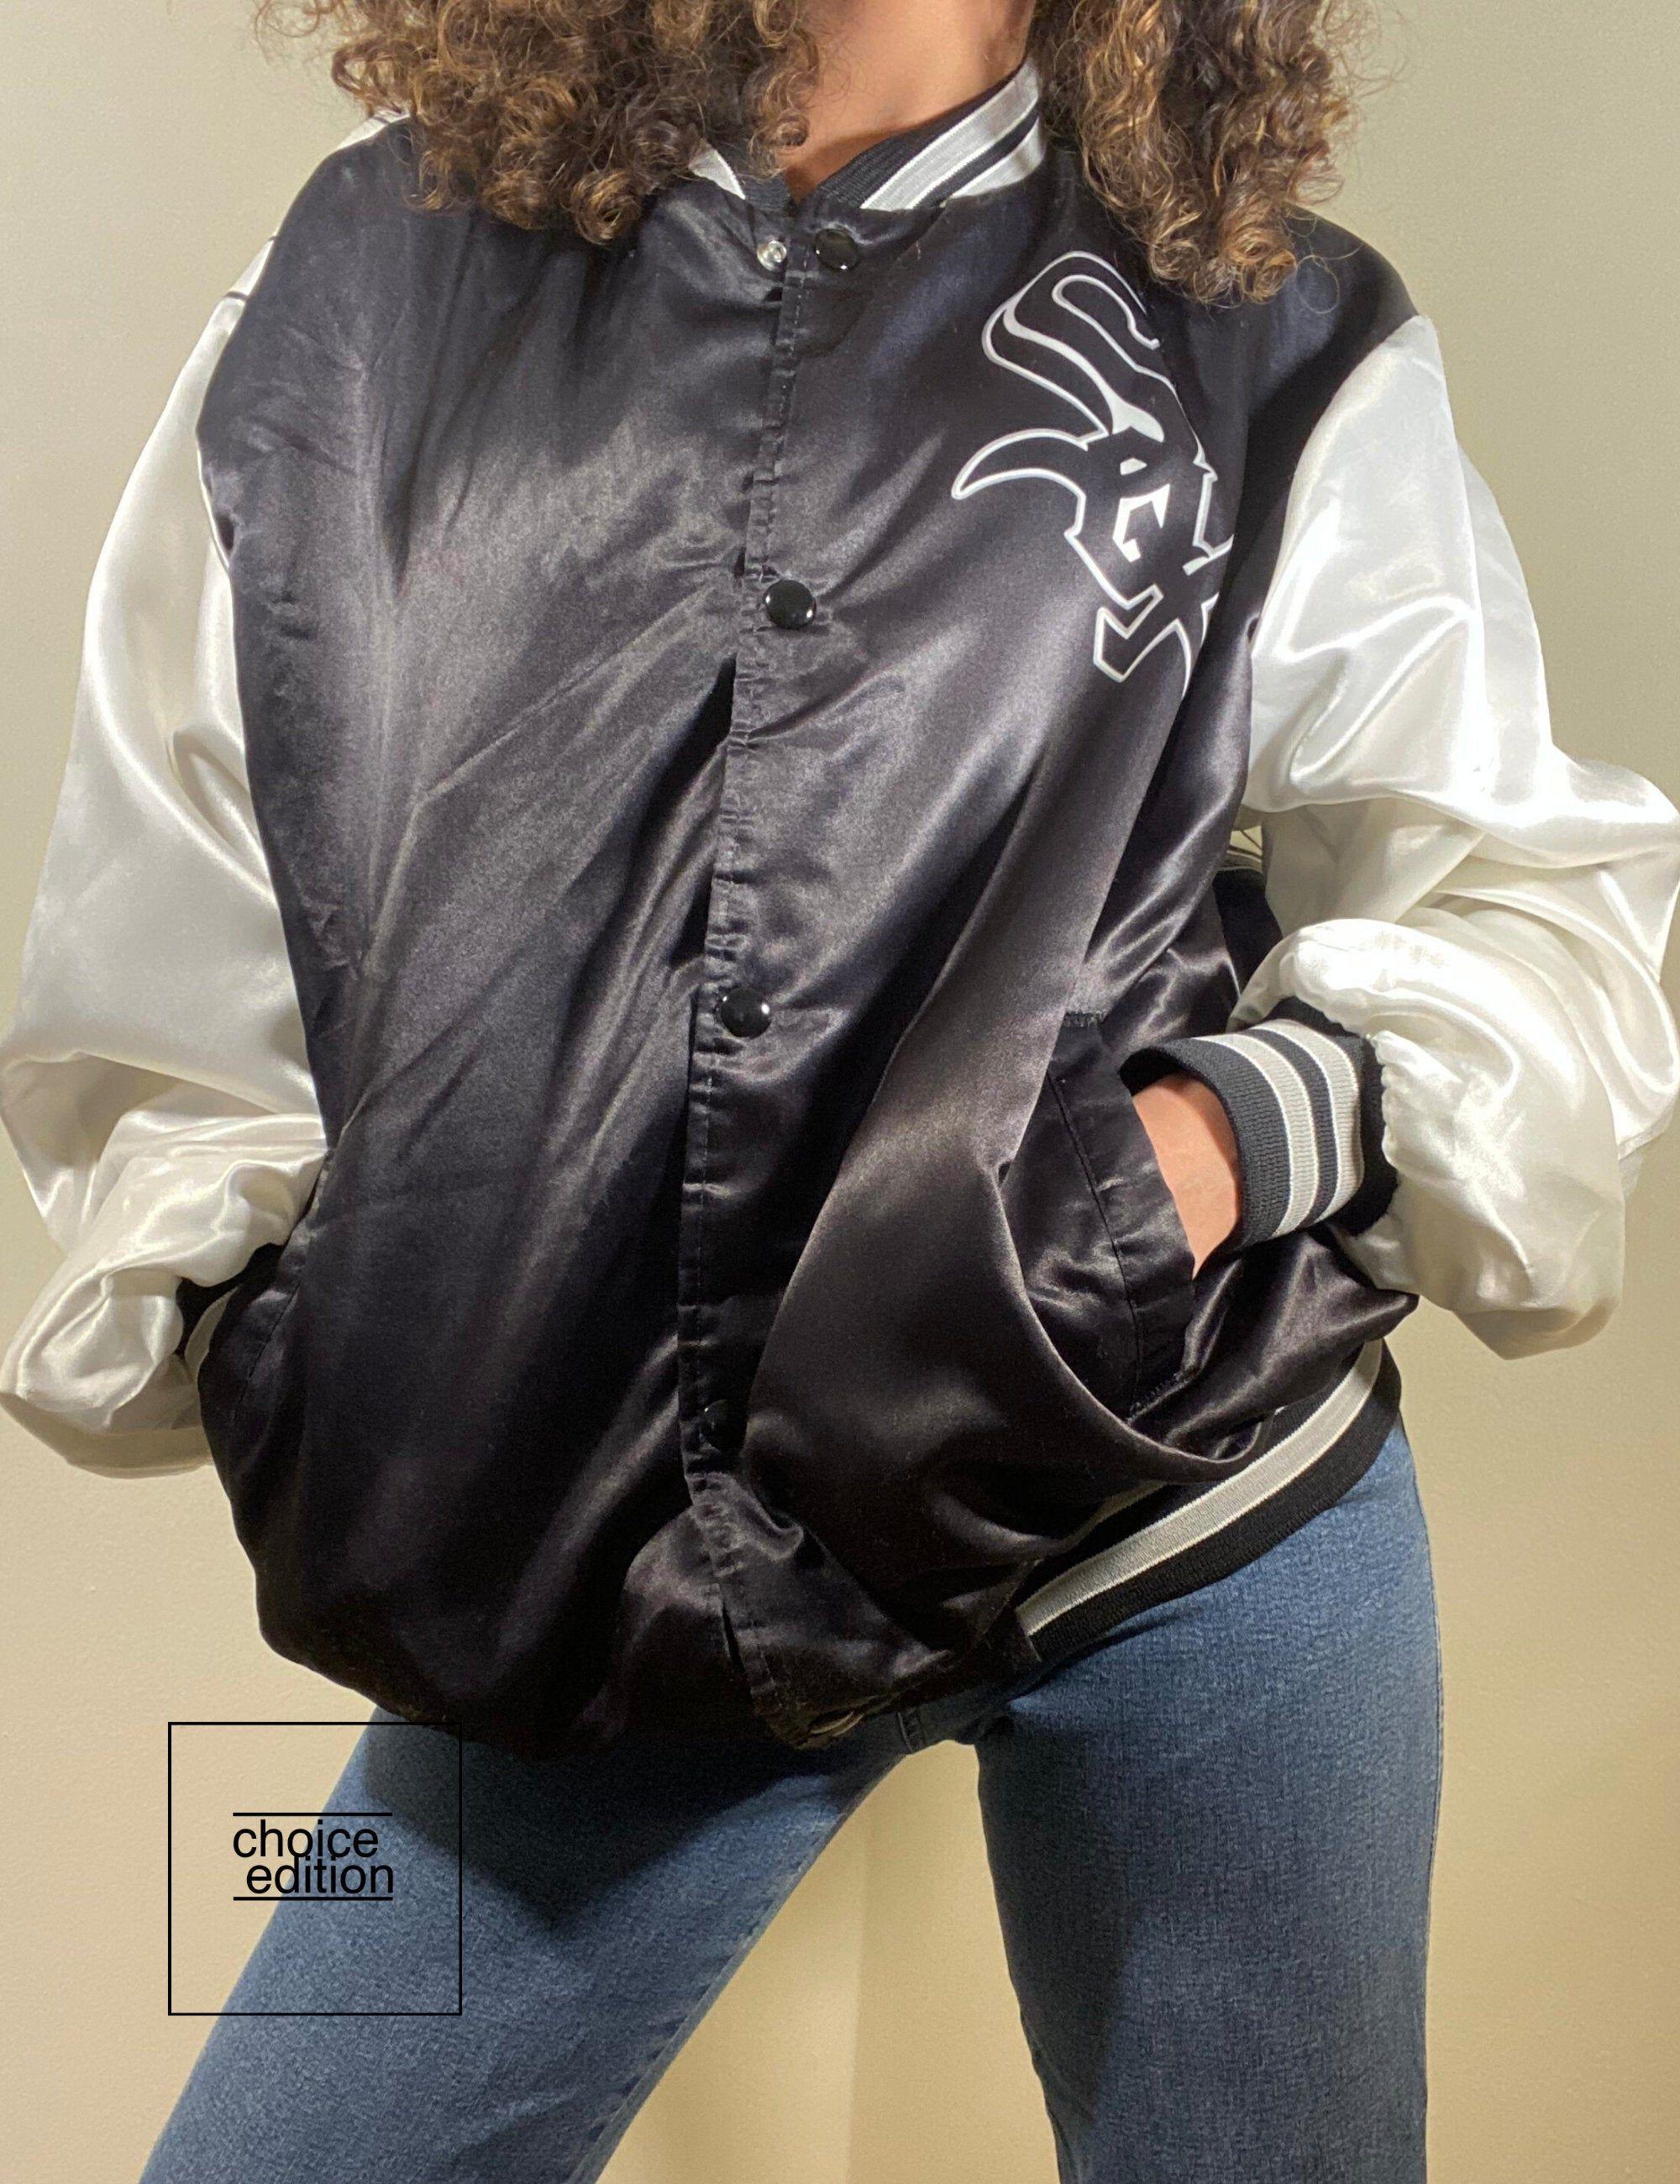 Vintage 90s Satin White Sox Chicago Bomber Jacket Made In Usa Bomber Jacket Vintage Bomber Jacket Polo Jackets [ 2600 x 2000 Pixel ]